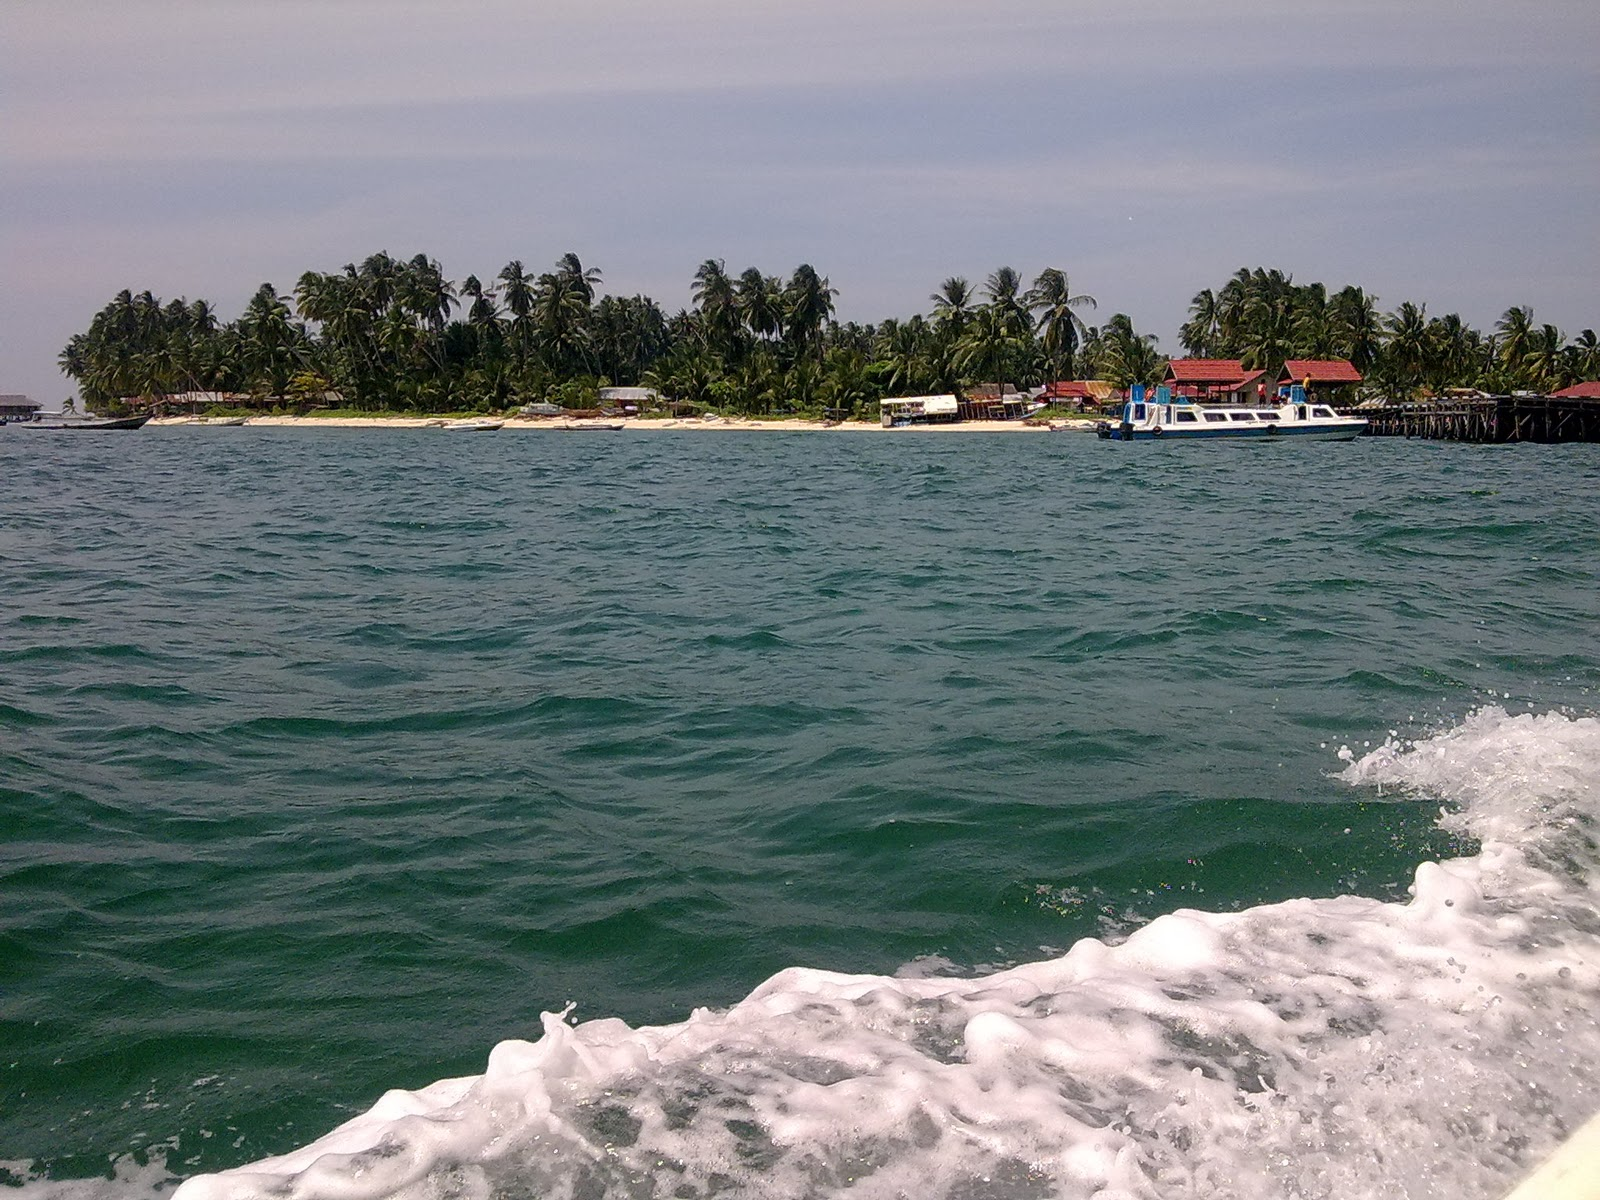 Cerita pulau derawan